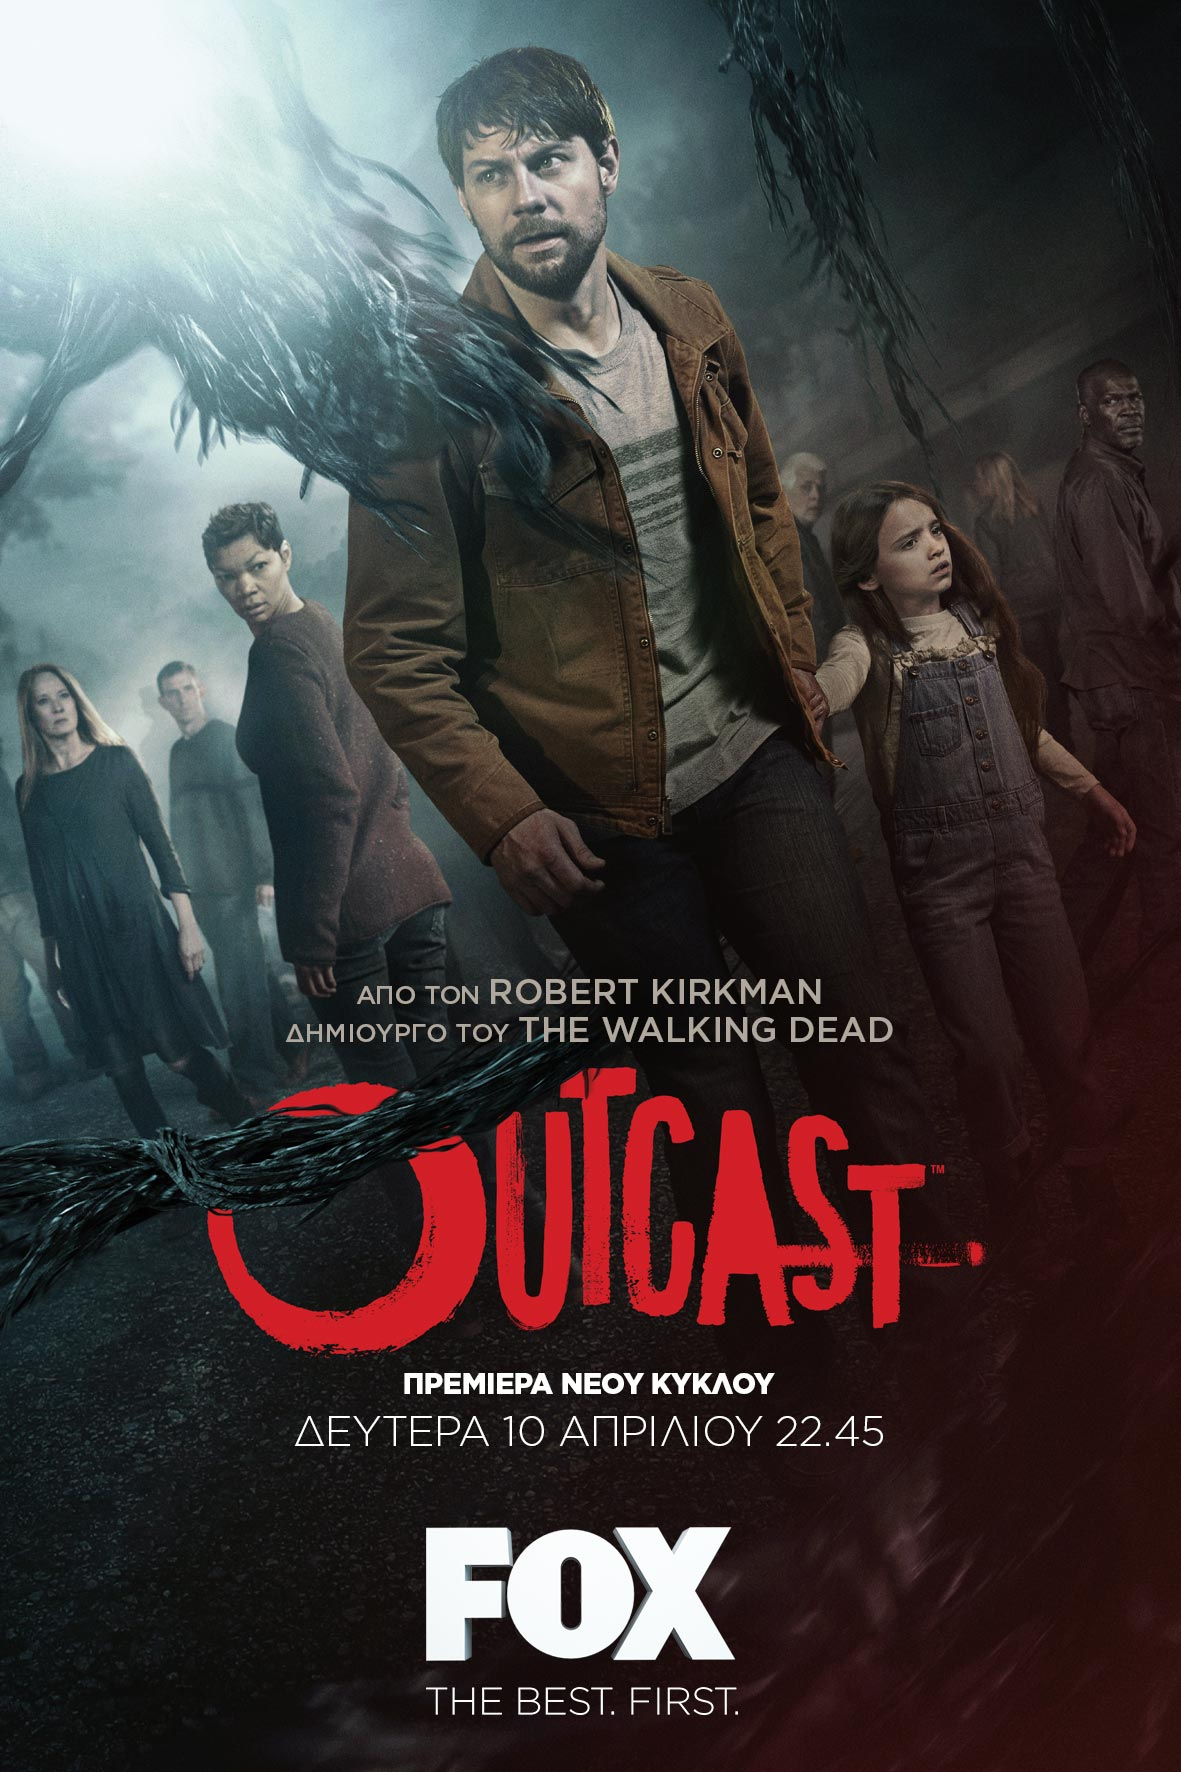 FOX_Outcast (Poster)